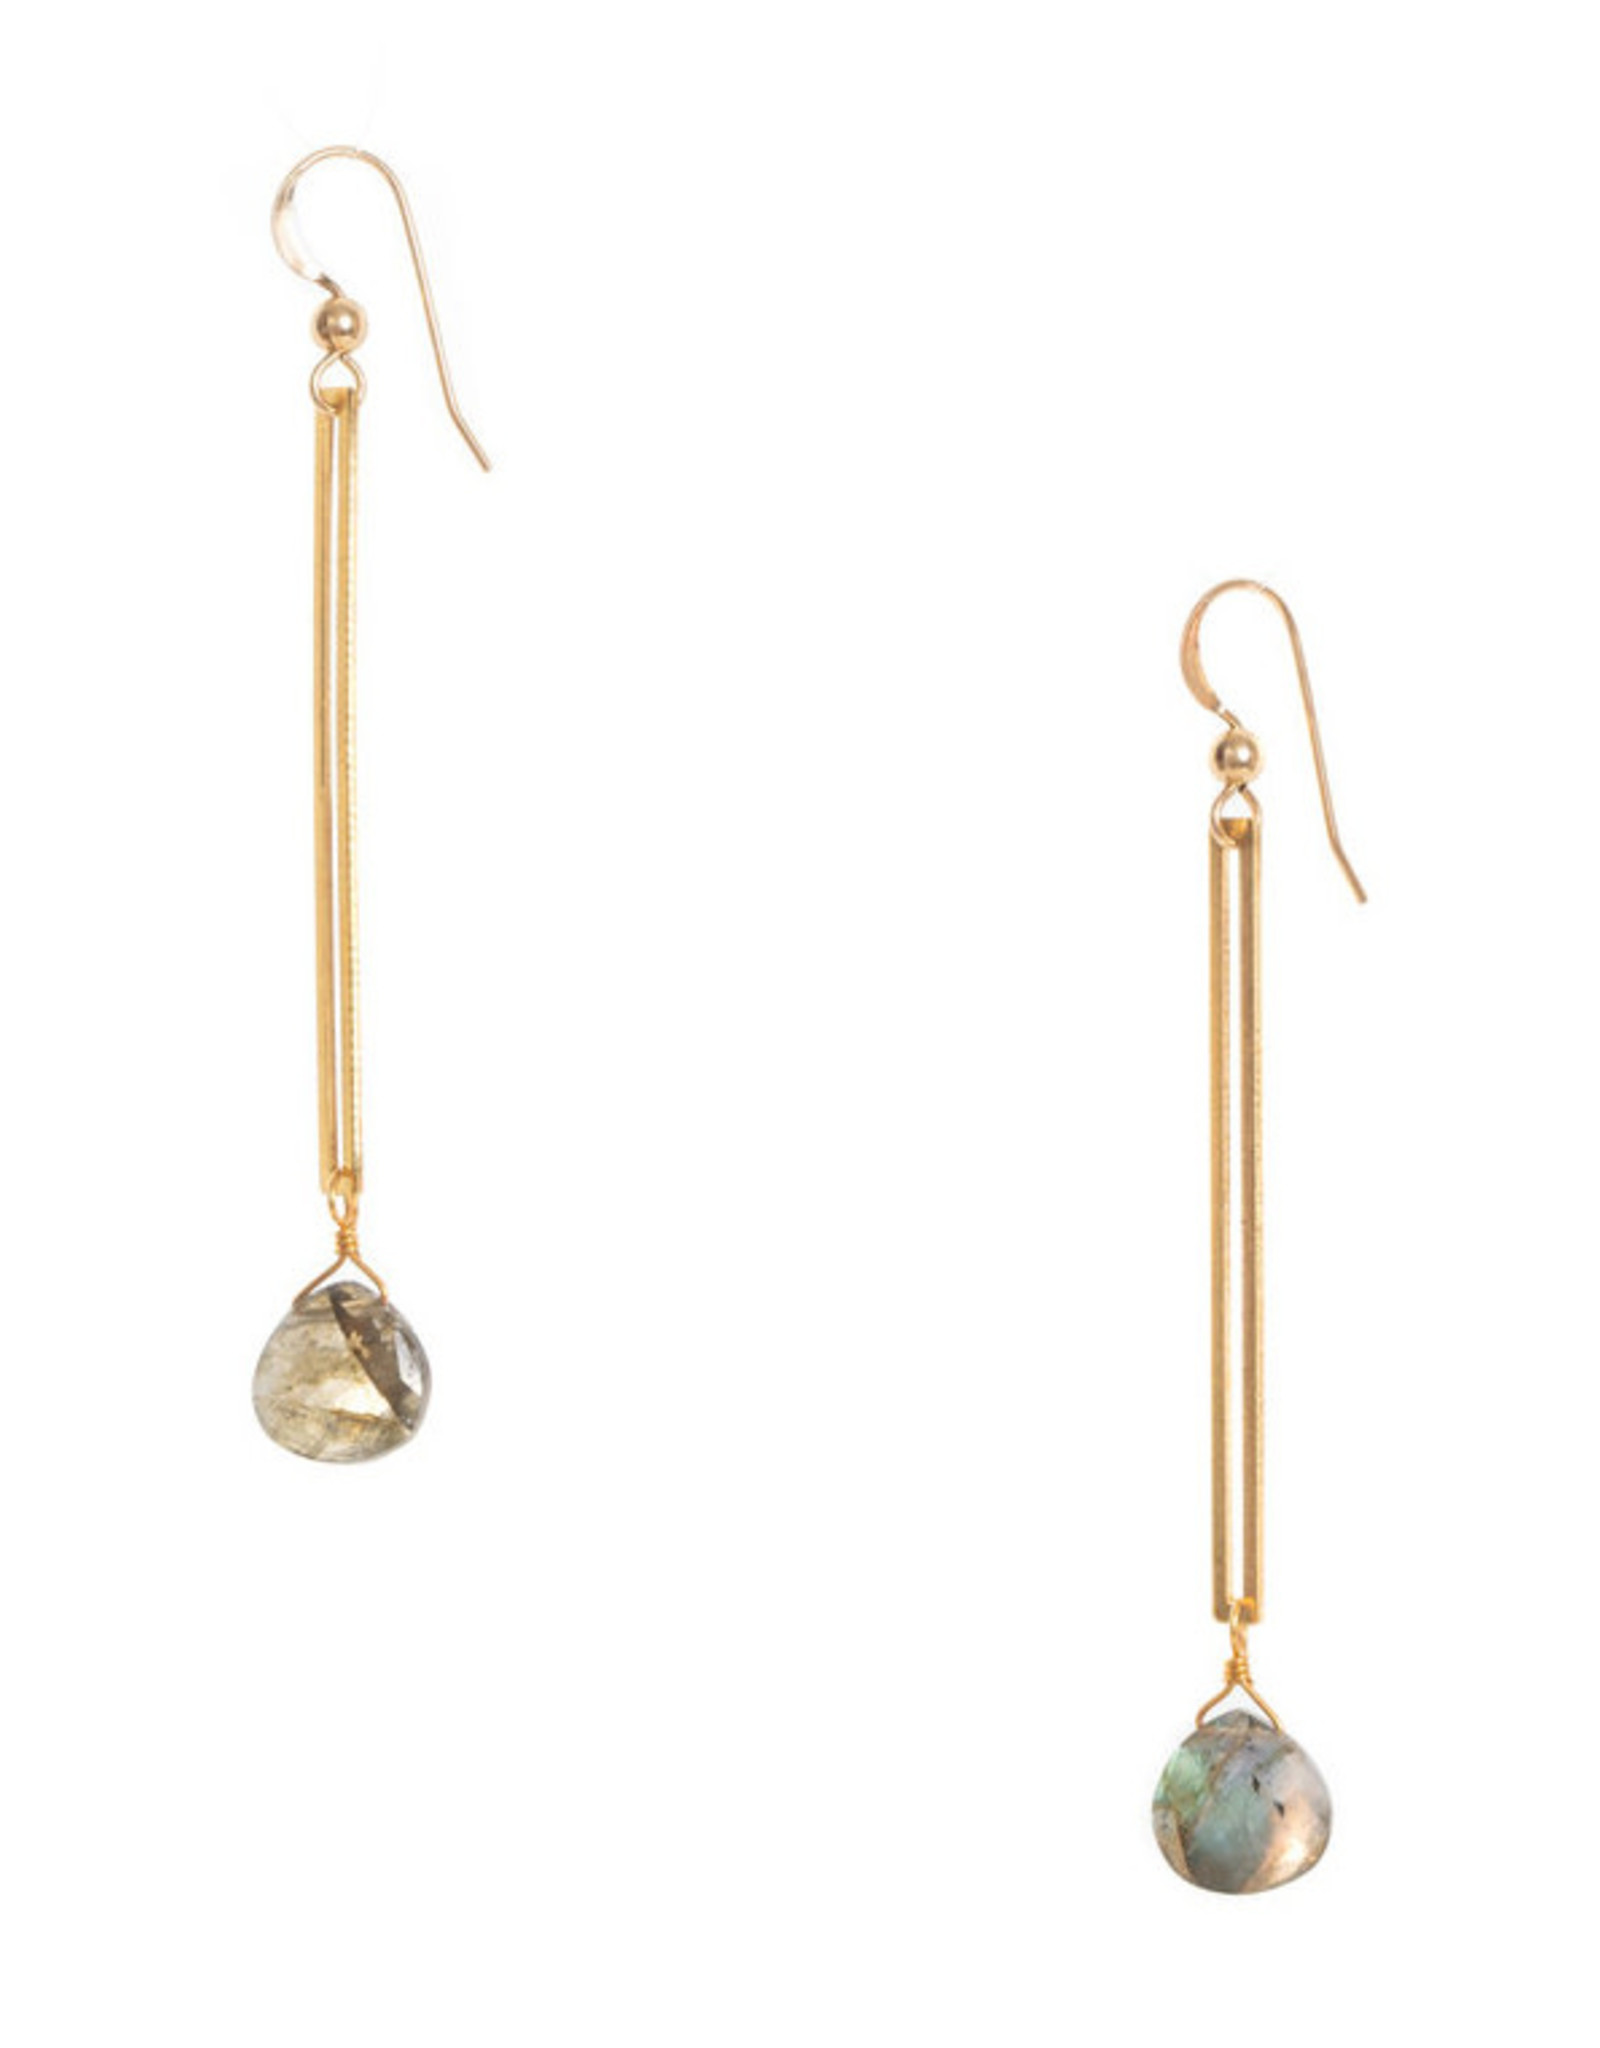 Hailey Gerrits Designs Isla Earrings - Labradorite